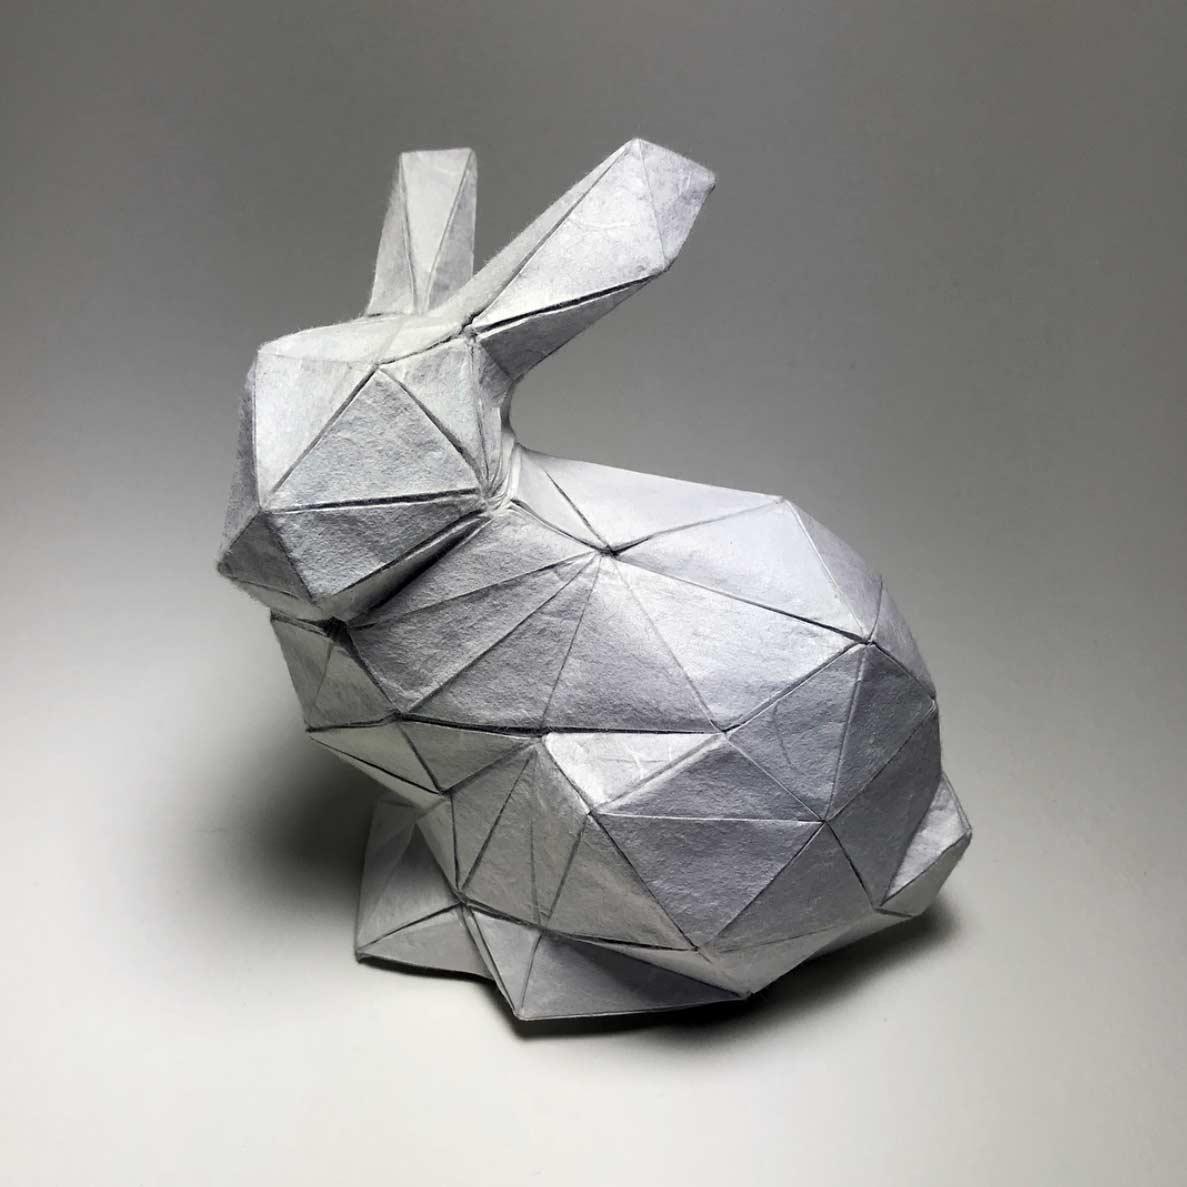 Geniale Origami-Kunstwerke von Robby Kraft Robby-Kraft-Origami_09